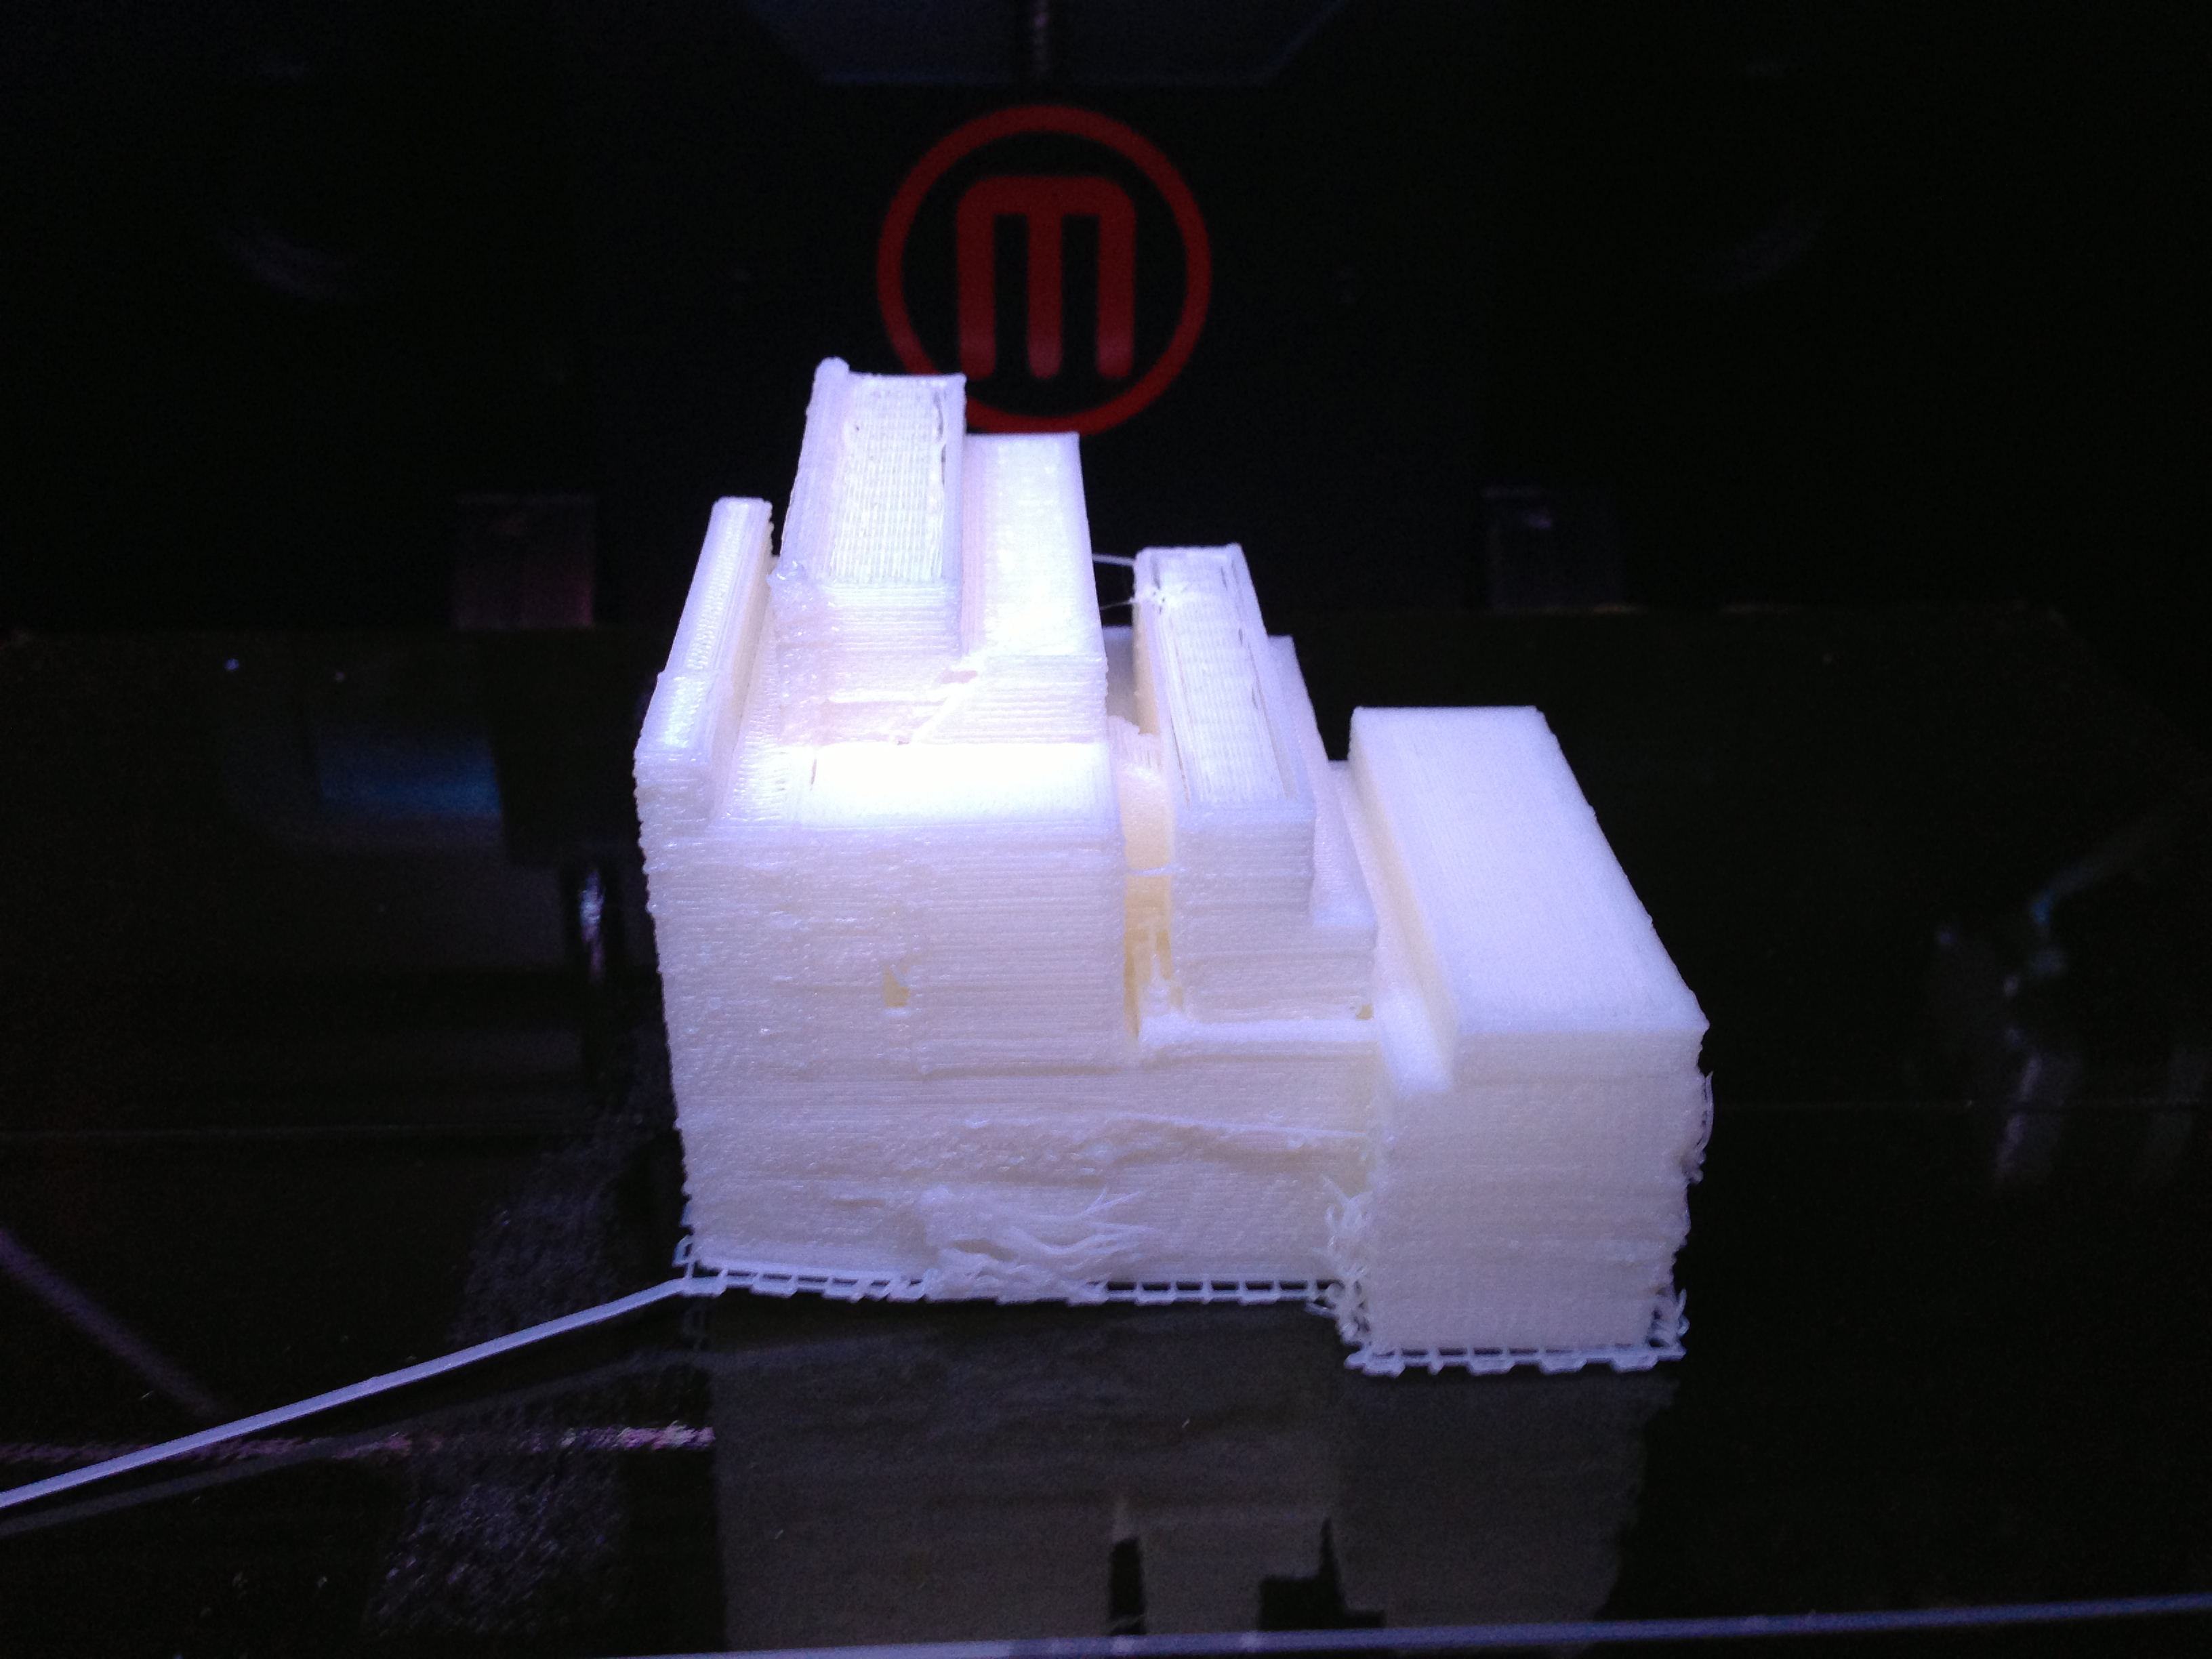 mir-aus 3d printing servie